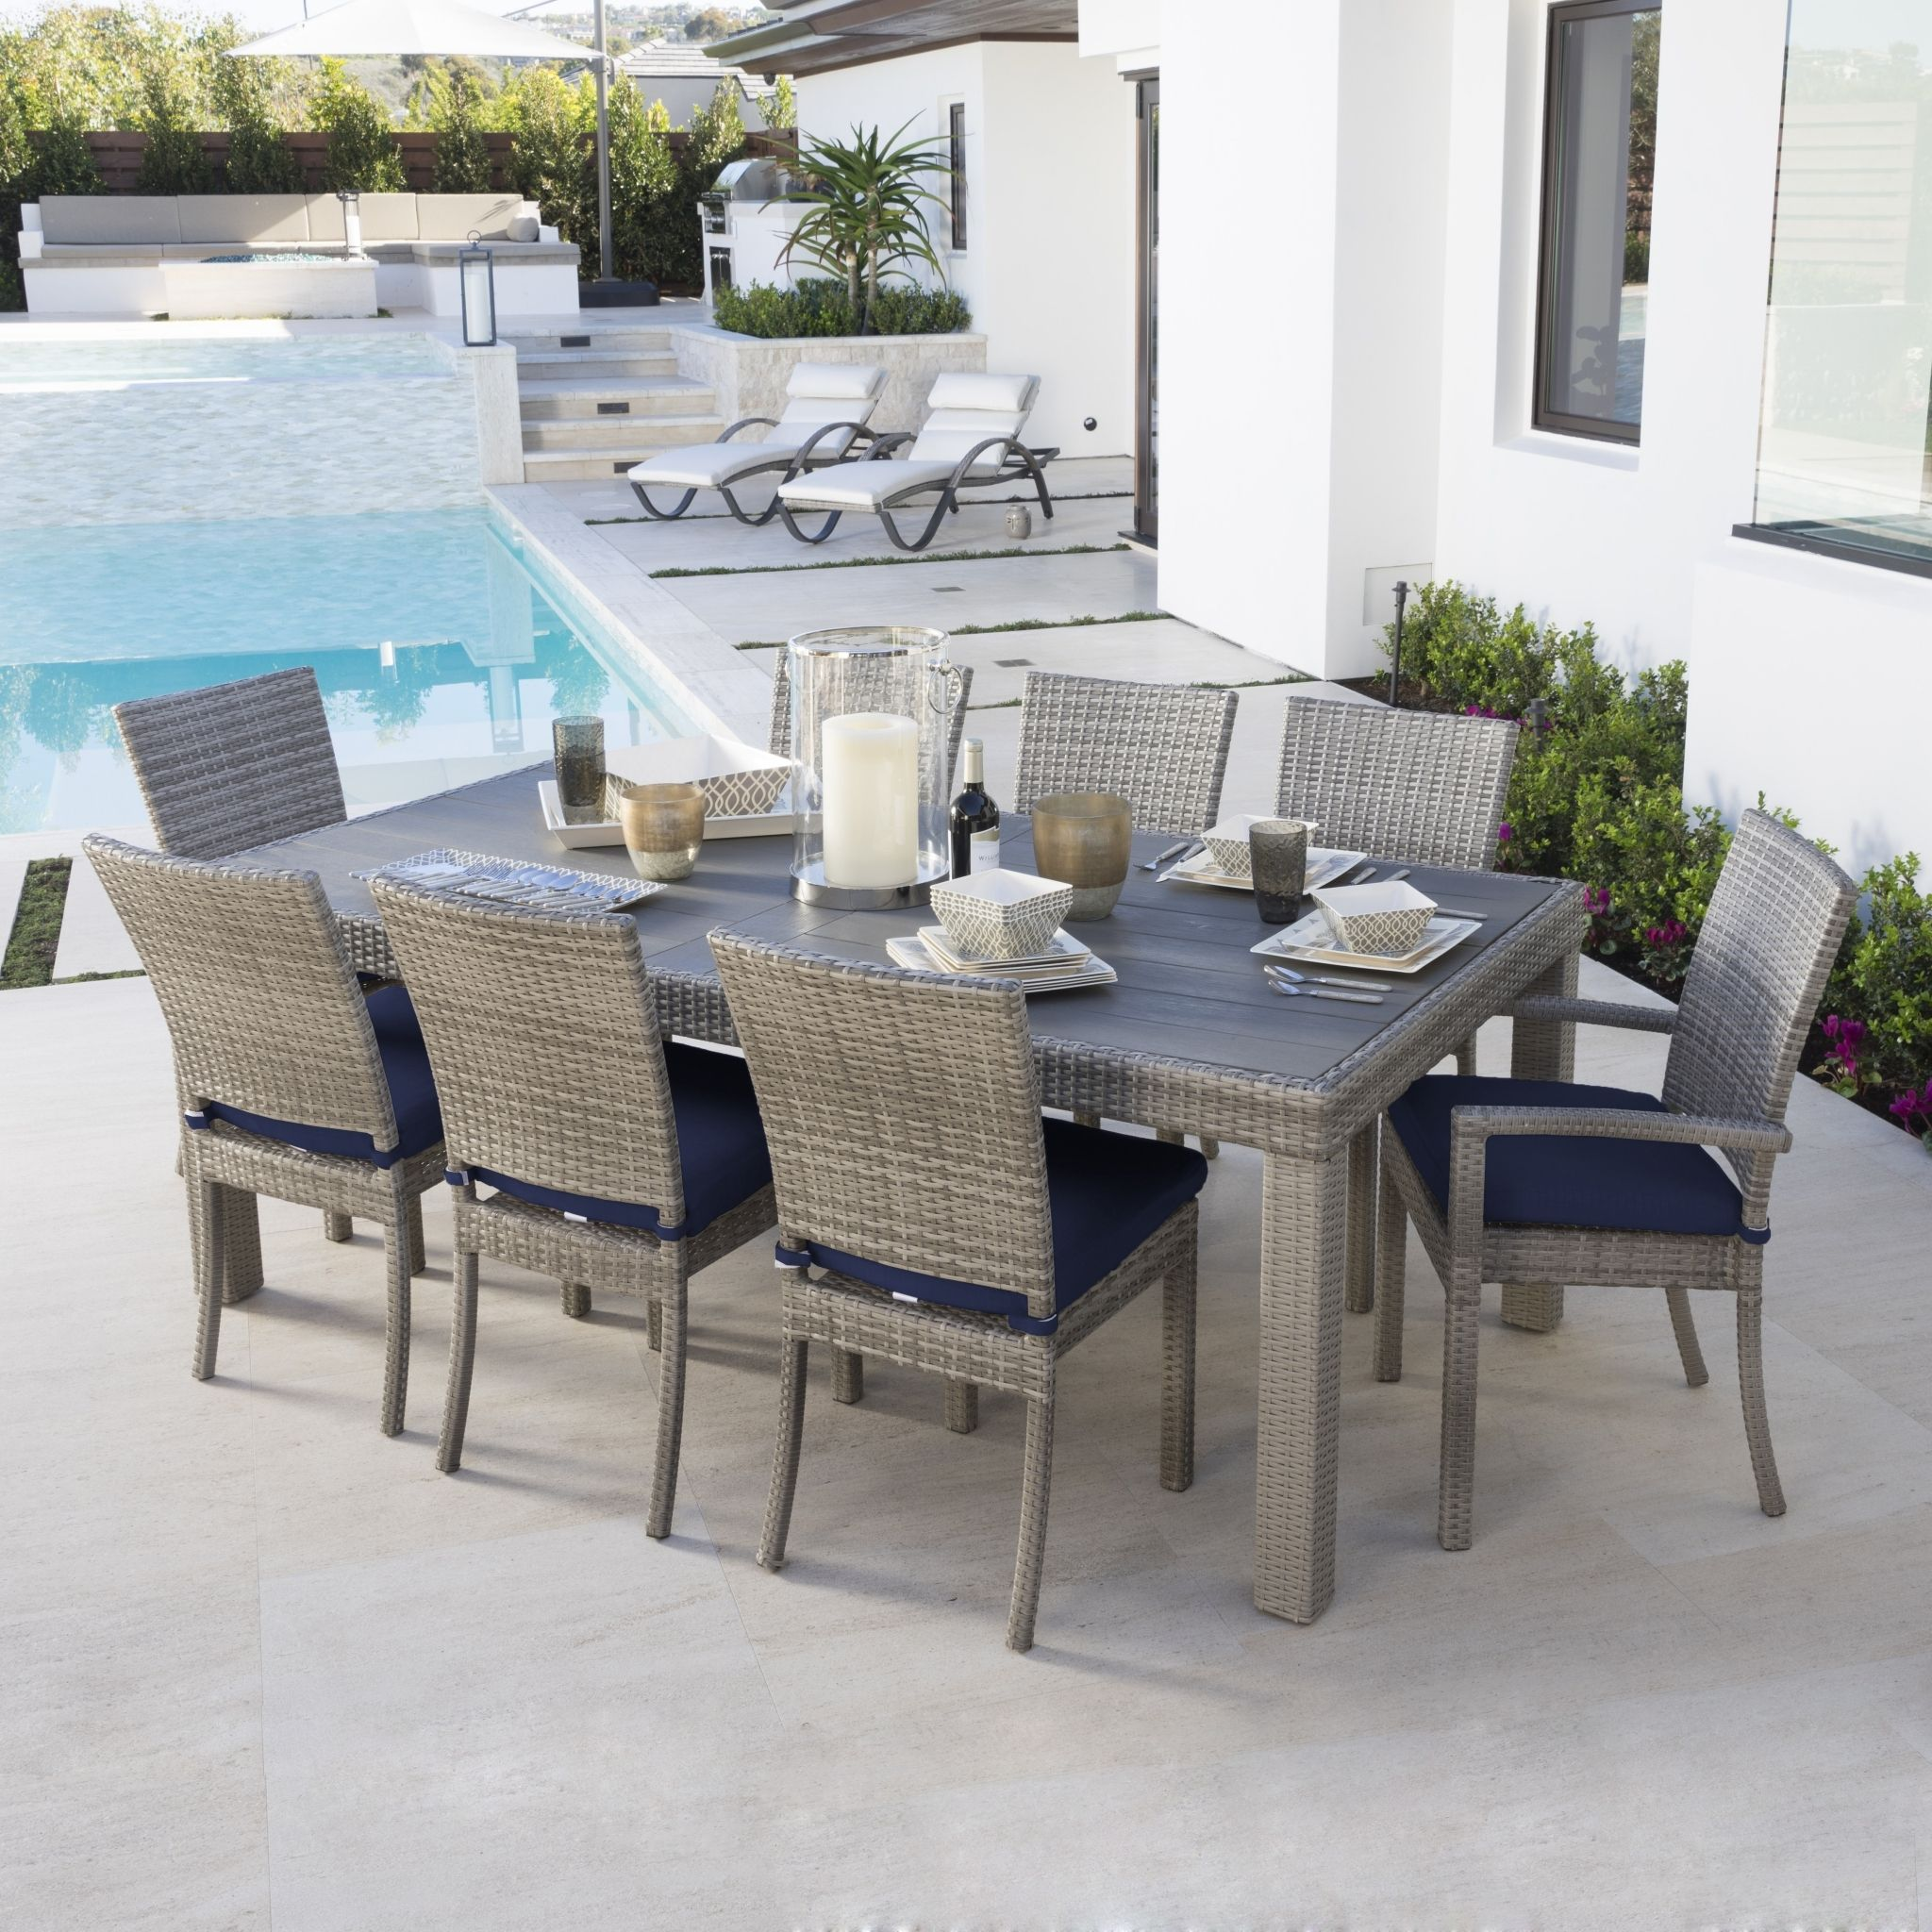 outdoor furniture fresno ca popular interior paint colors Check